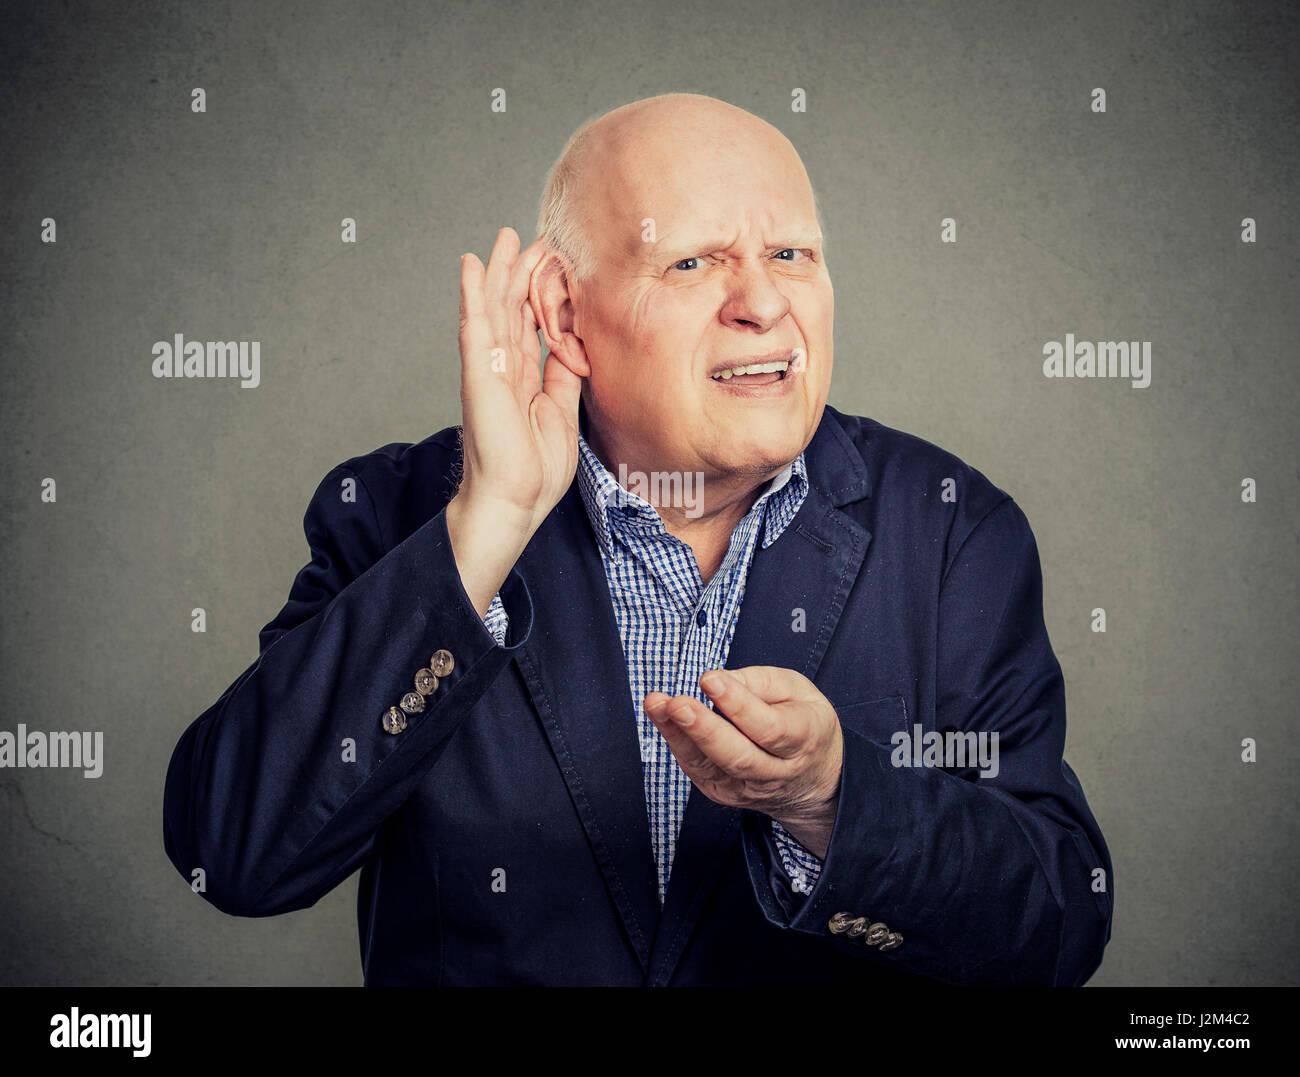 Senior man, hard of hearing, placing hand on ear asking someone to speak up - Stock Image